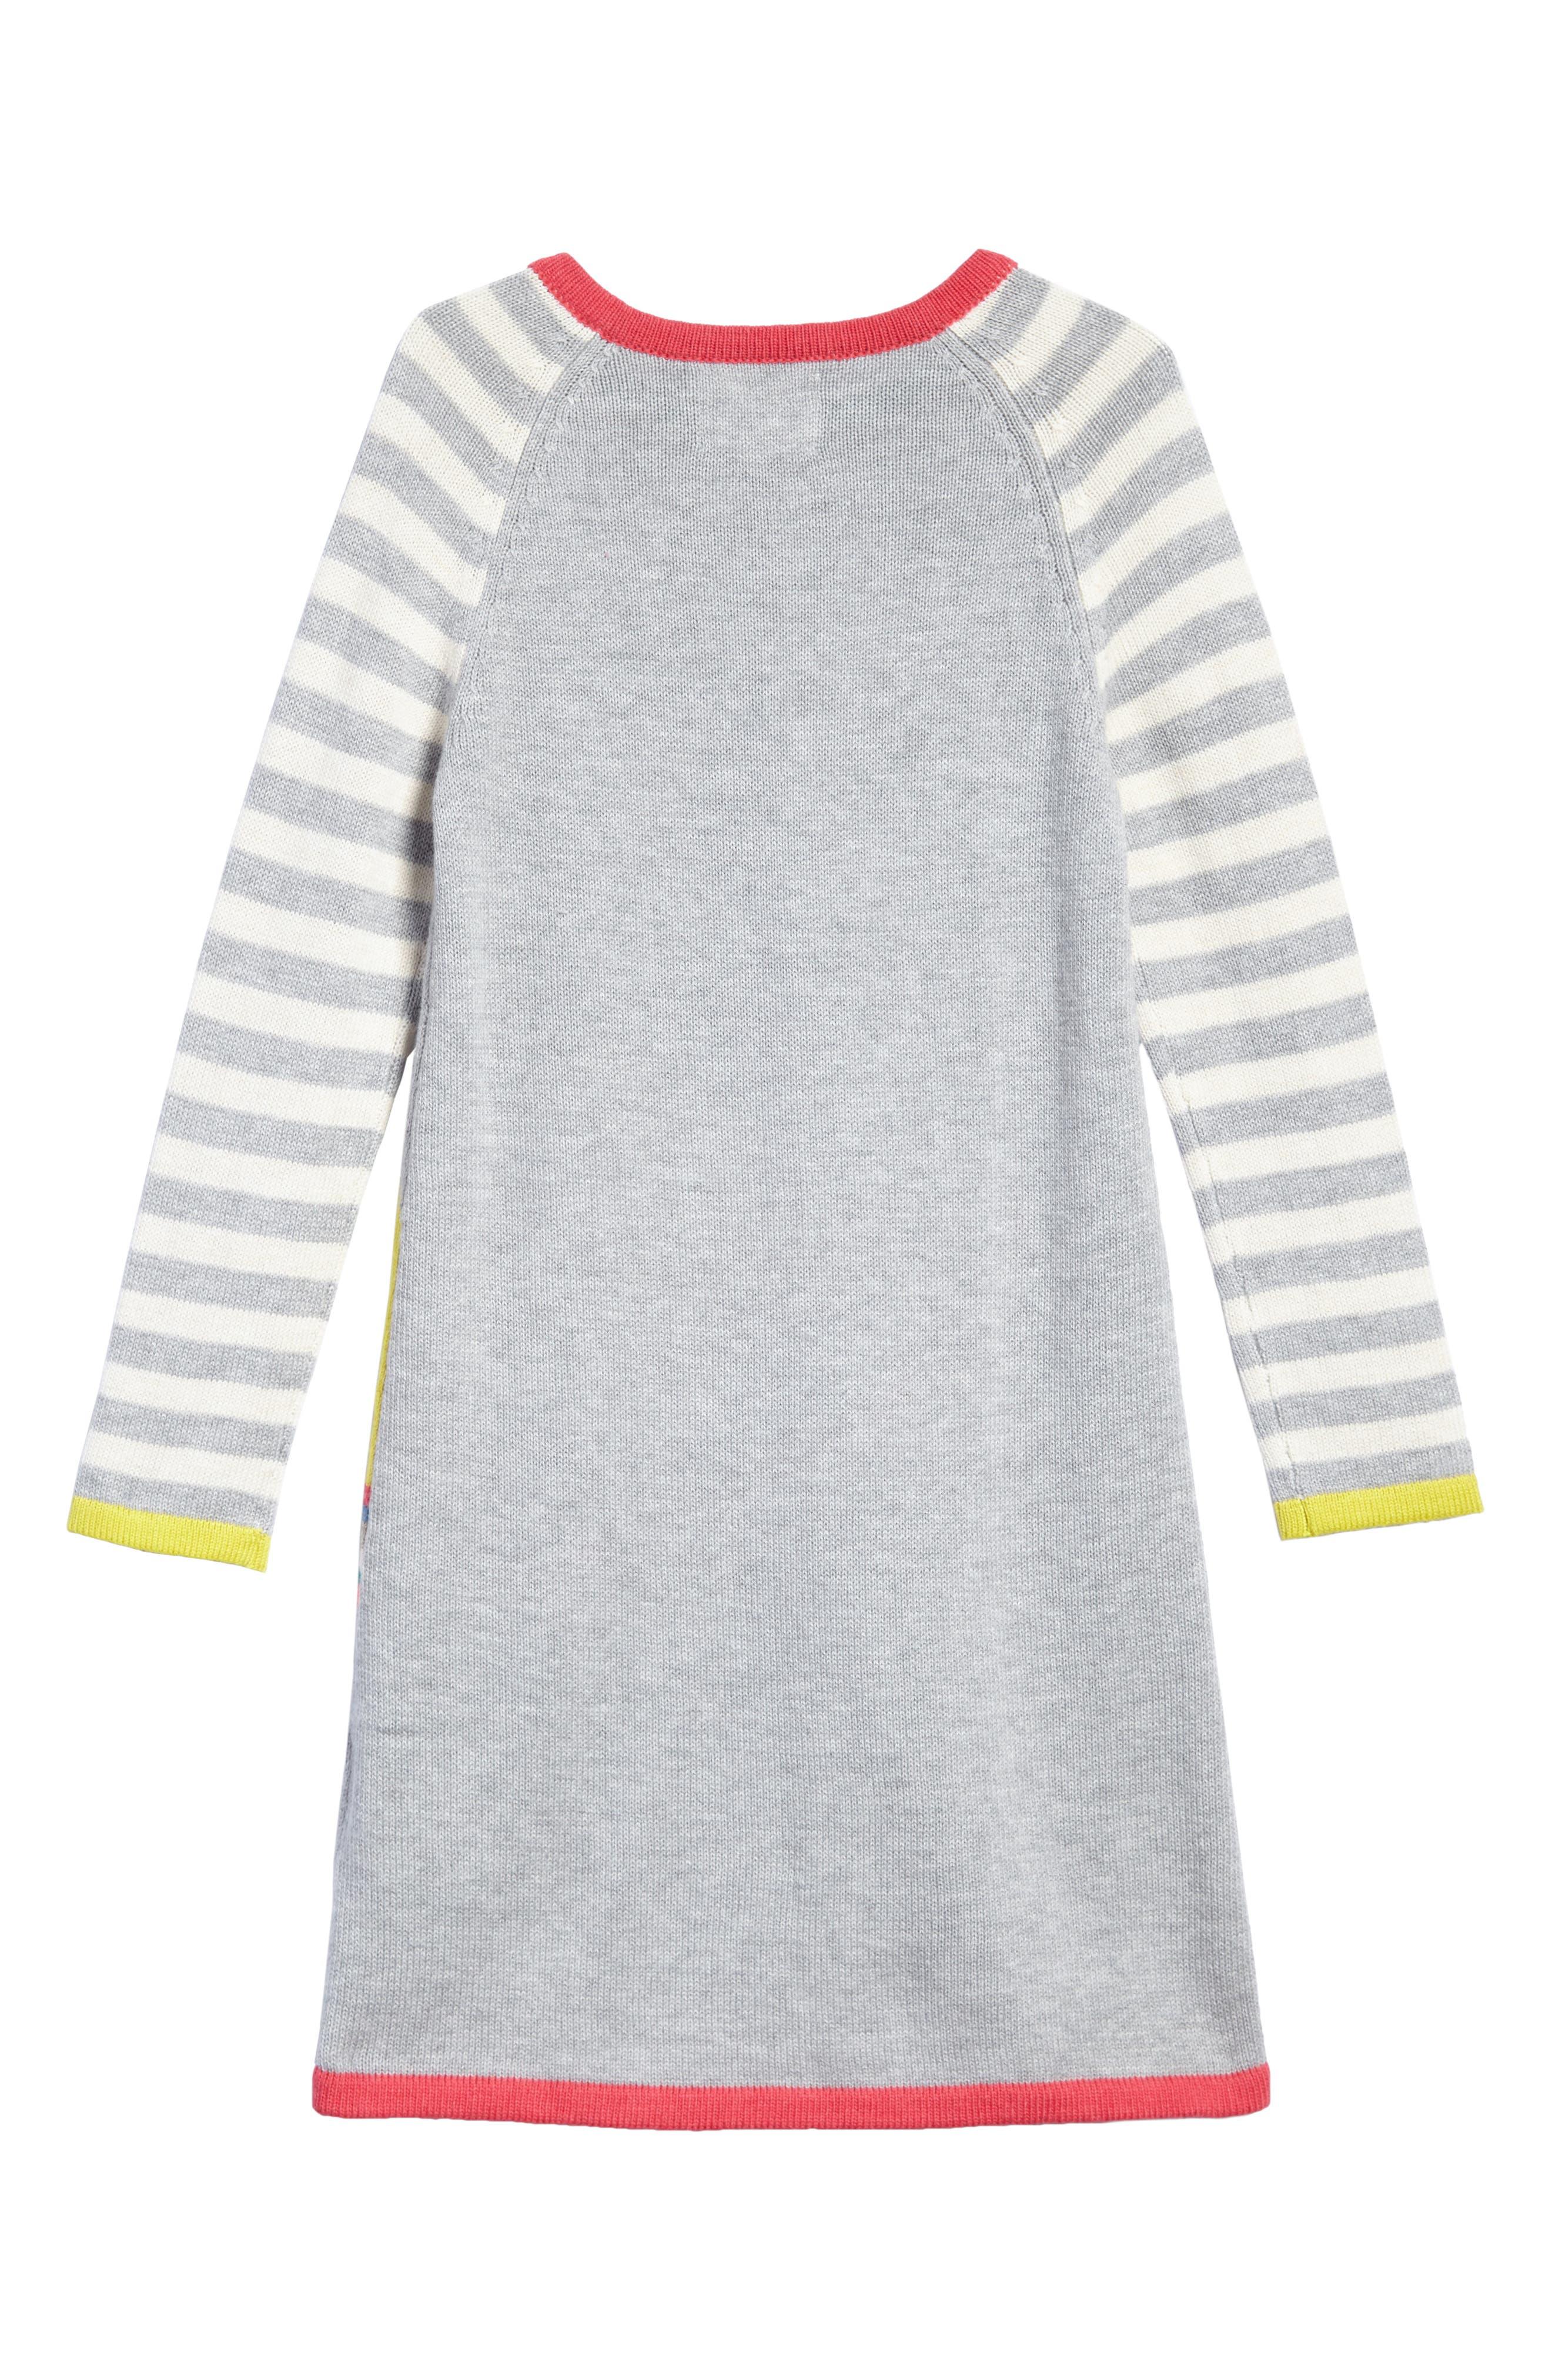 Fun Knit Dress,                             Alternate thumbnail 2, color,                             054